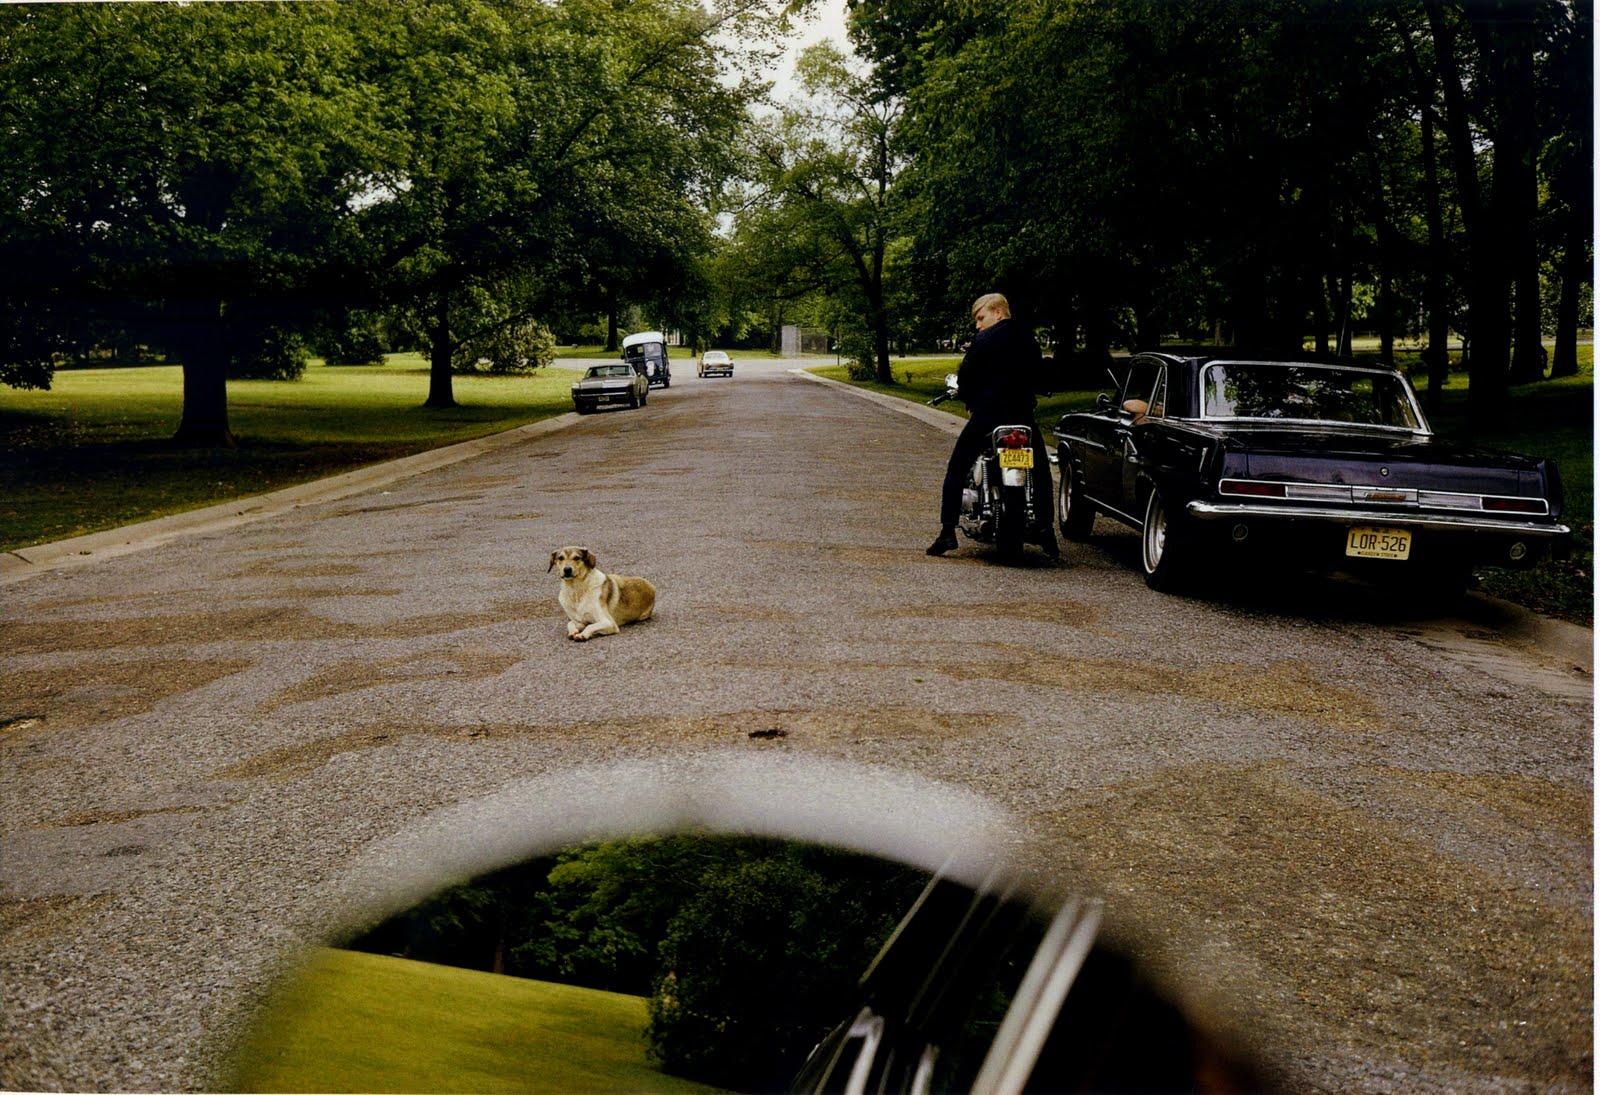 photographersbooks-william-egglestone-34.JPG